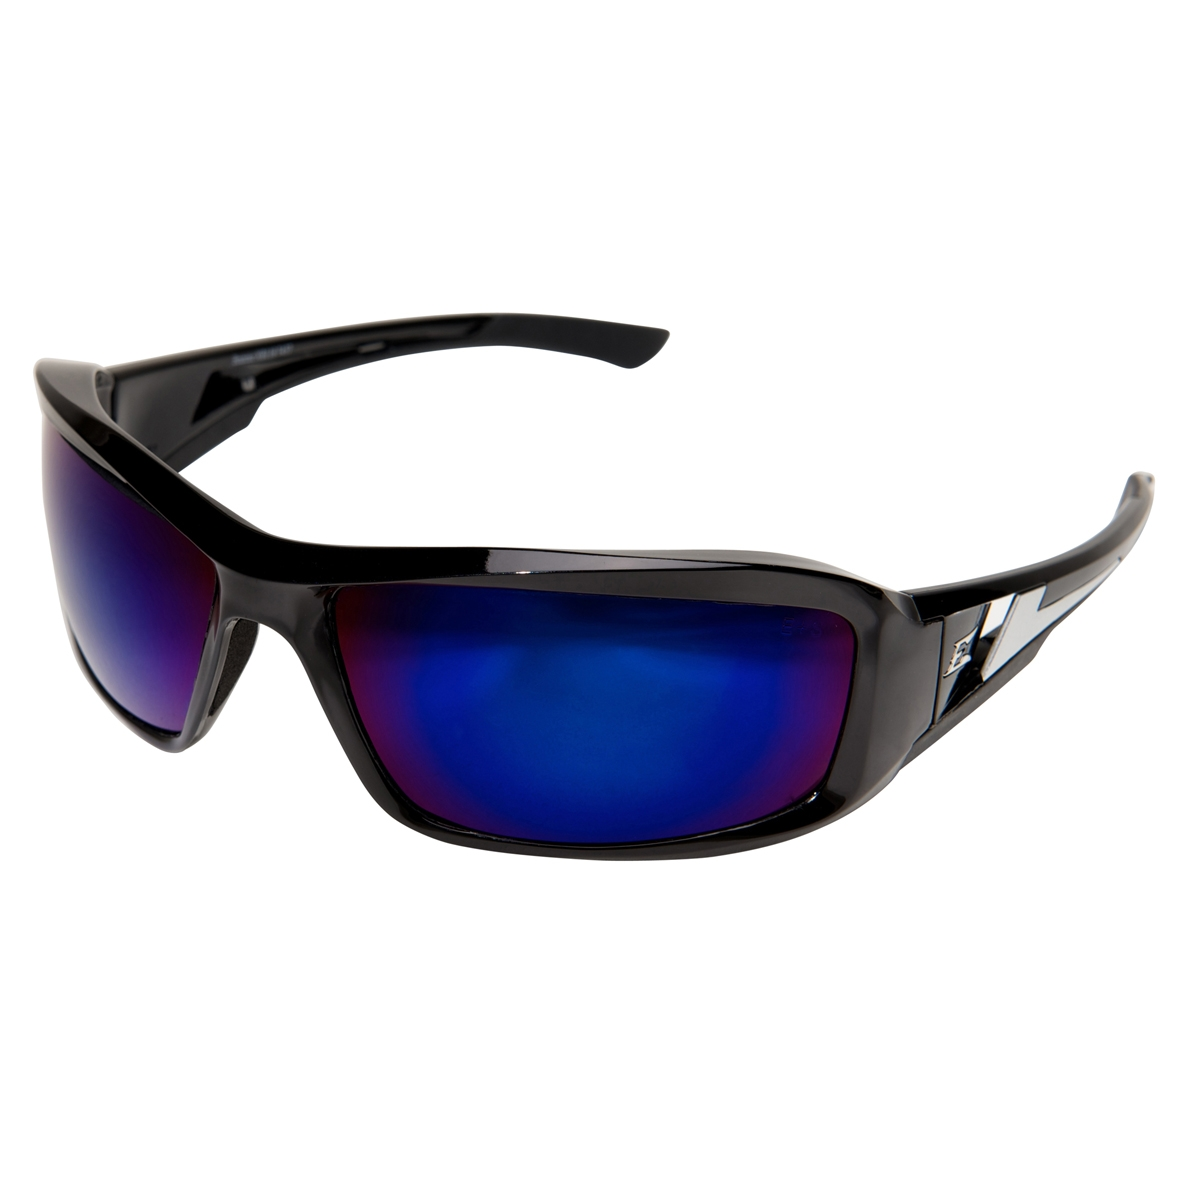 Safety Glasses Black Frame : Edge XB118 Brazeau Safety Glasses - Black Frame - Blue ...